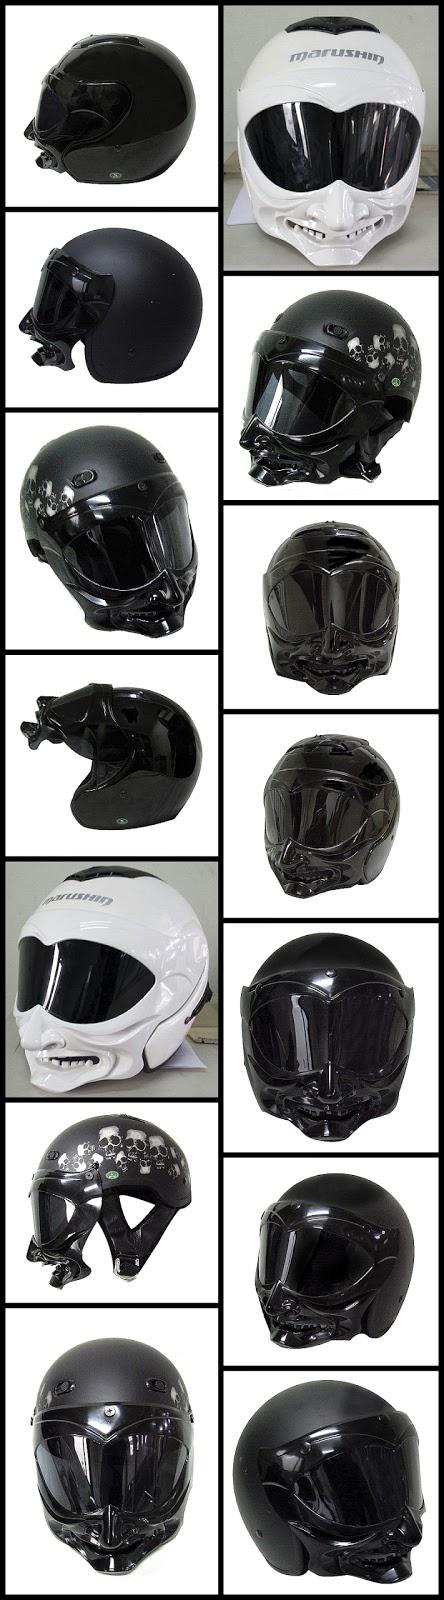 Skull Motorcycle Helmet Visor